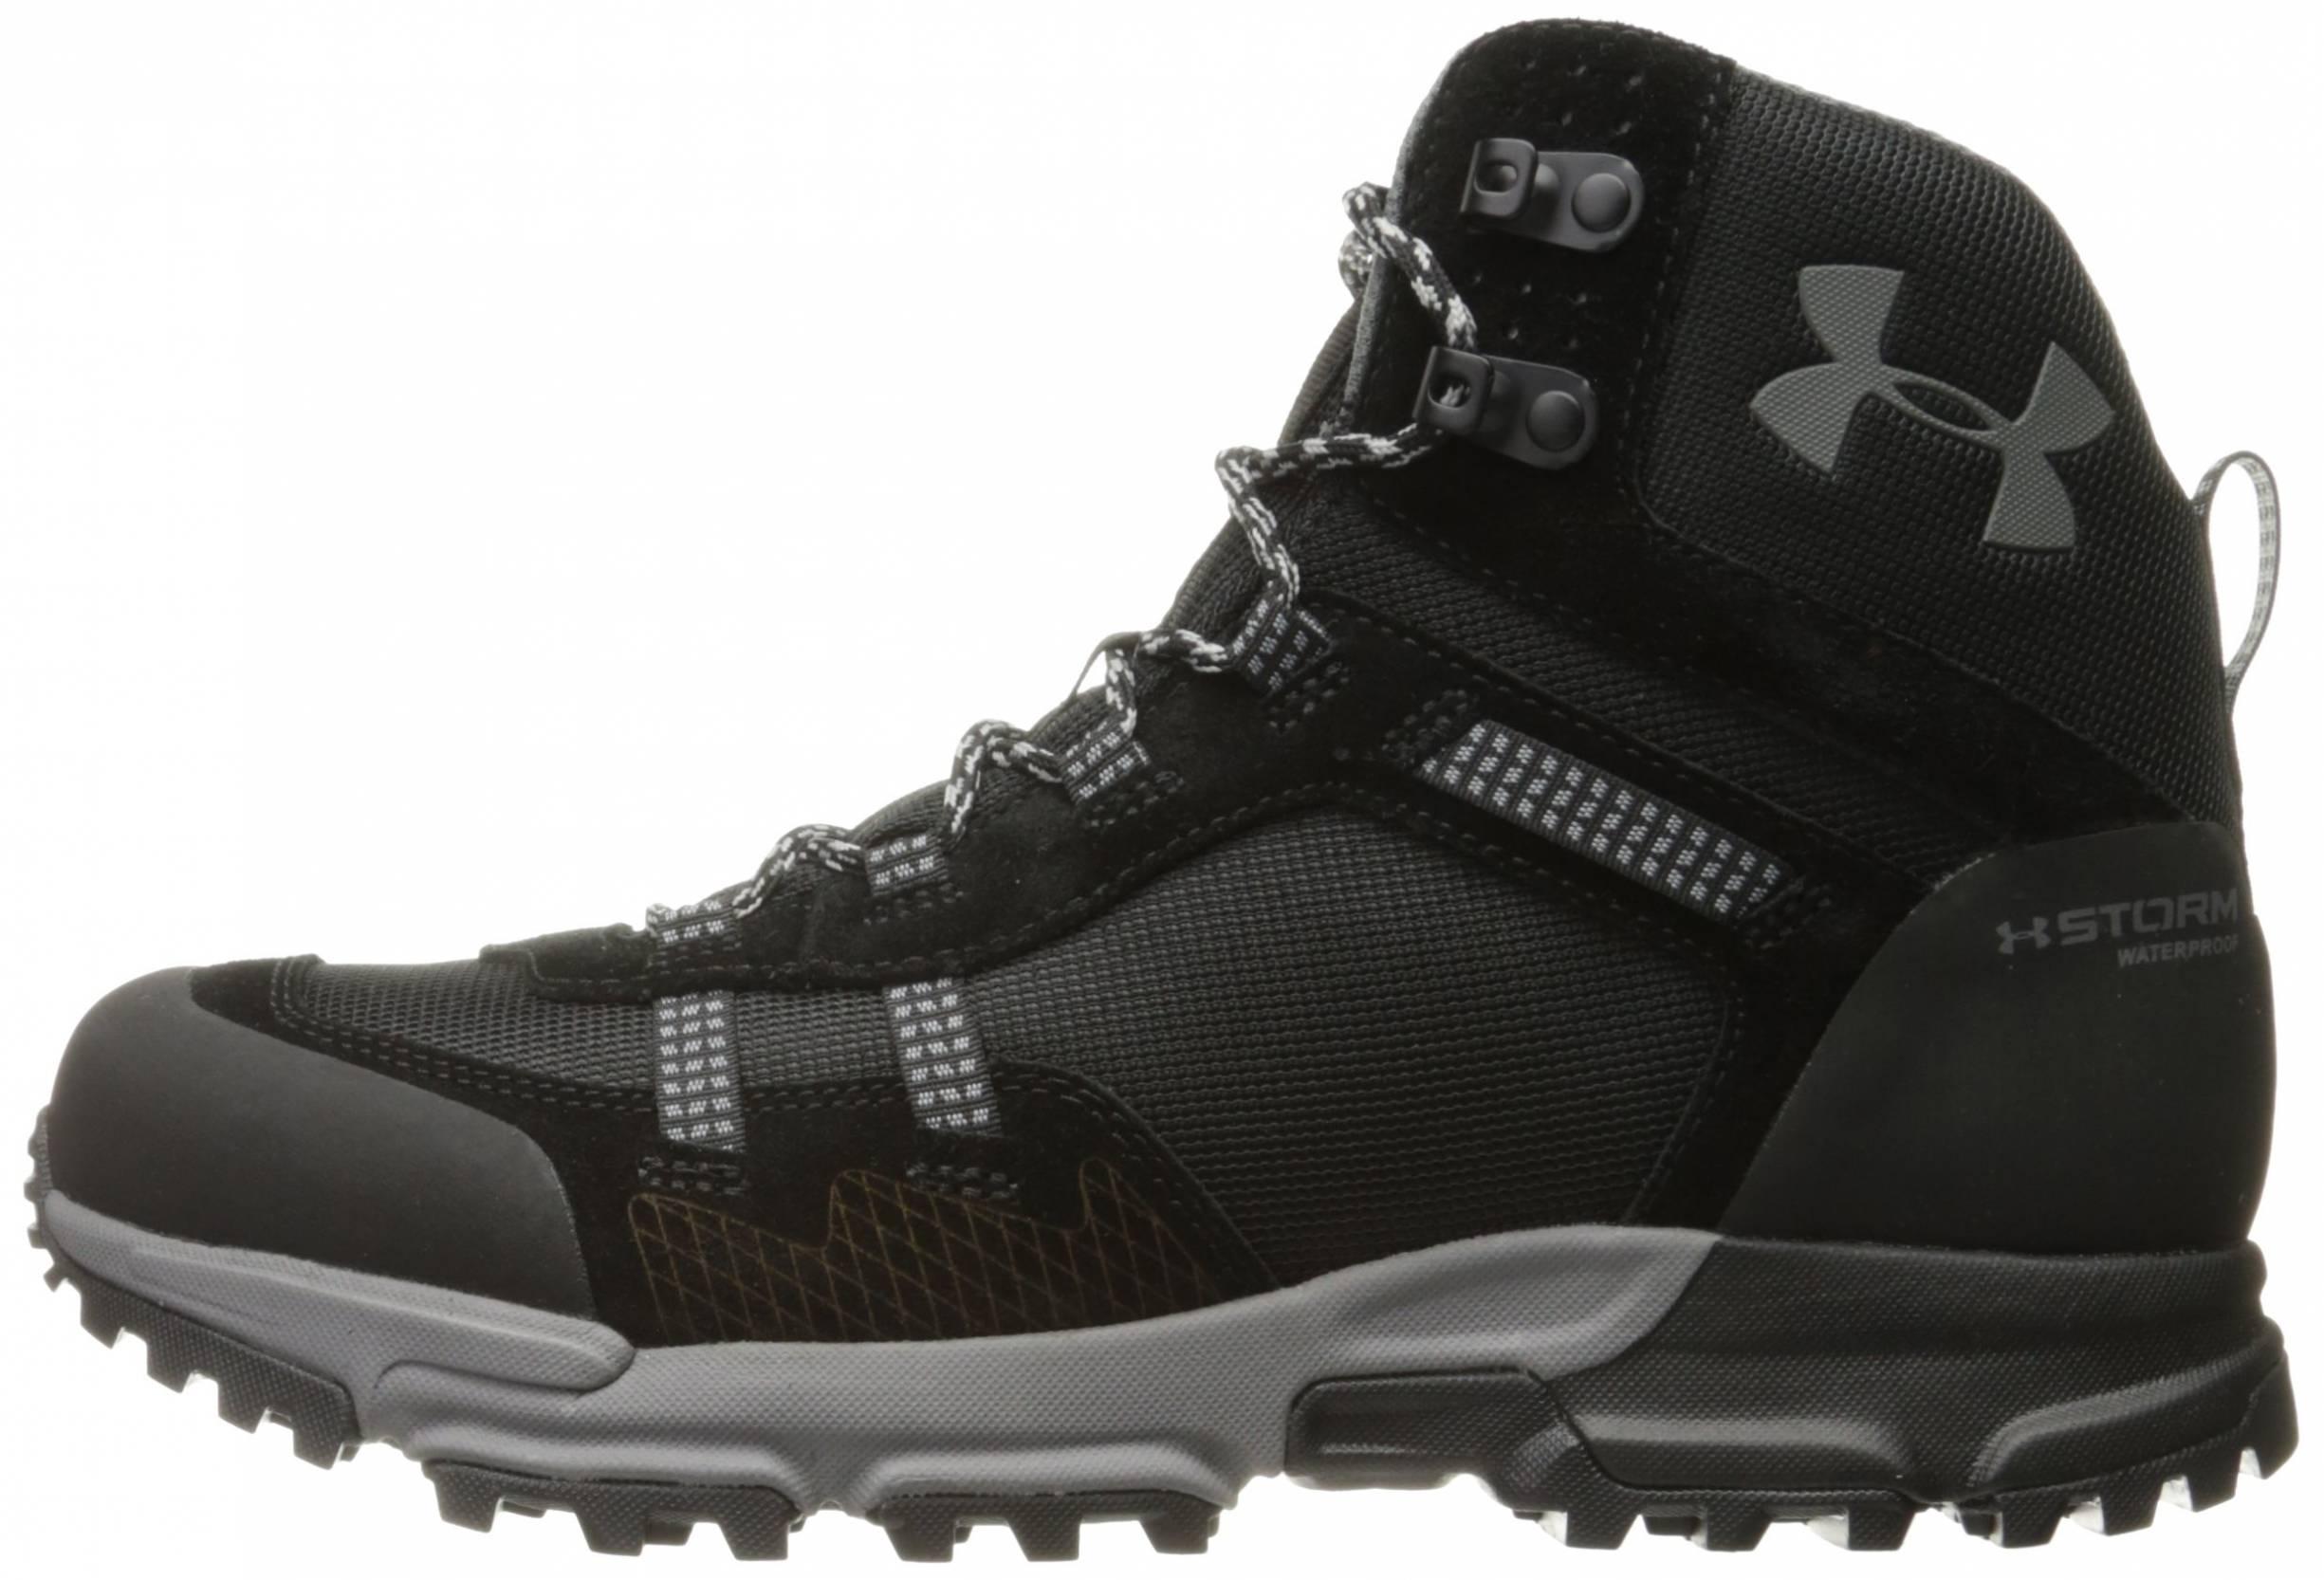 under armour men's brower mid waterproof hiking boot